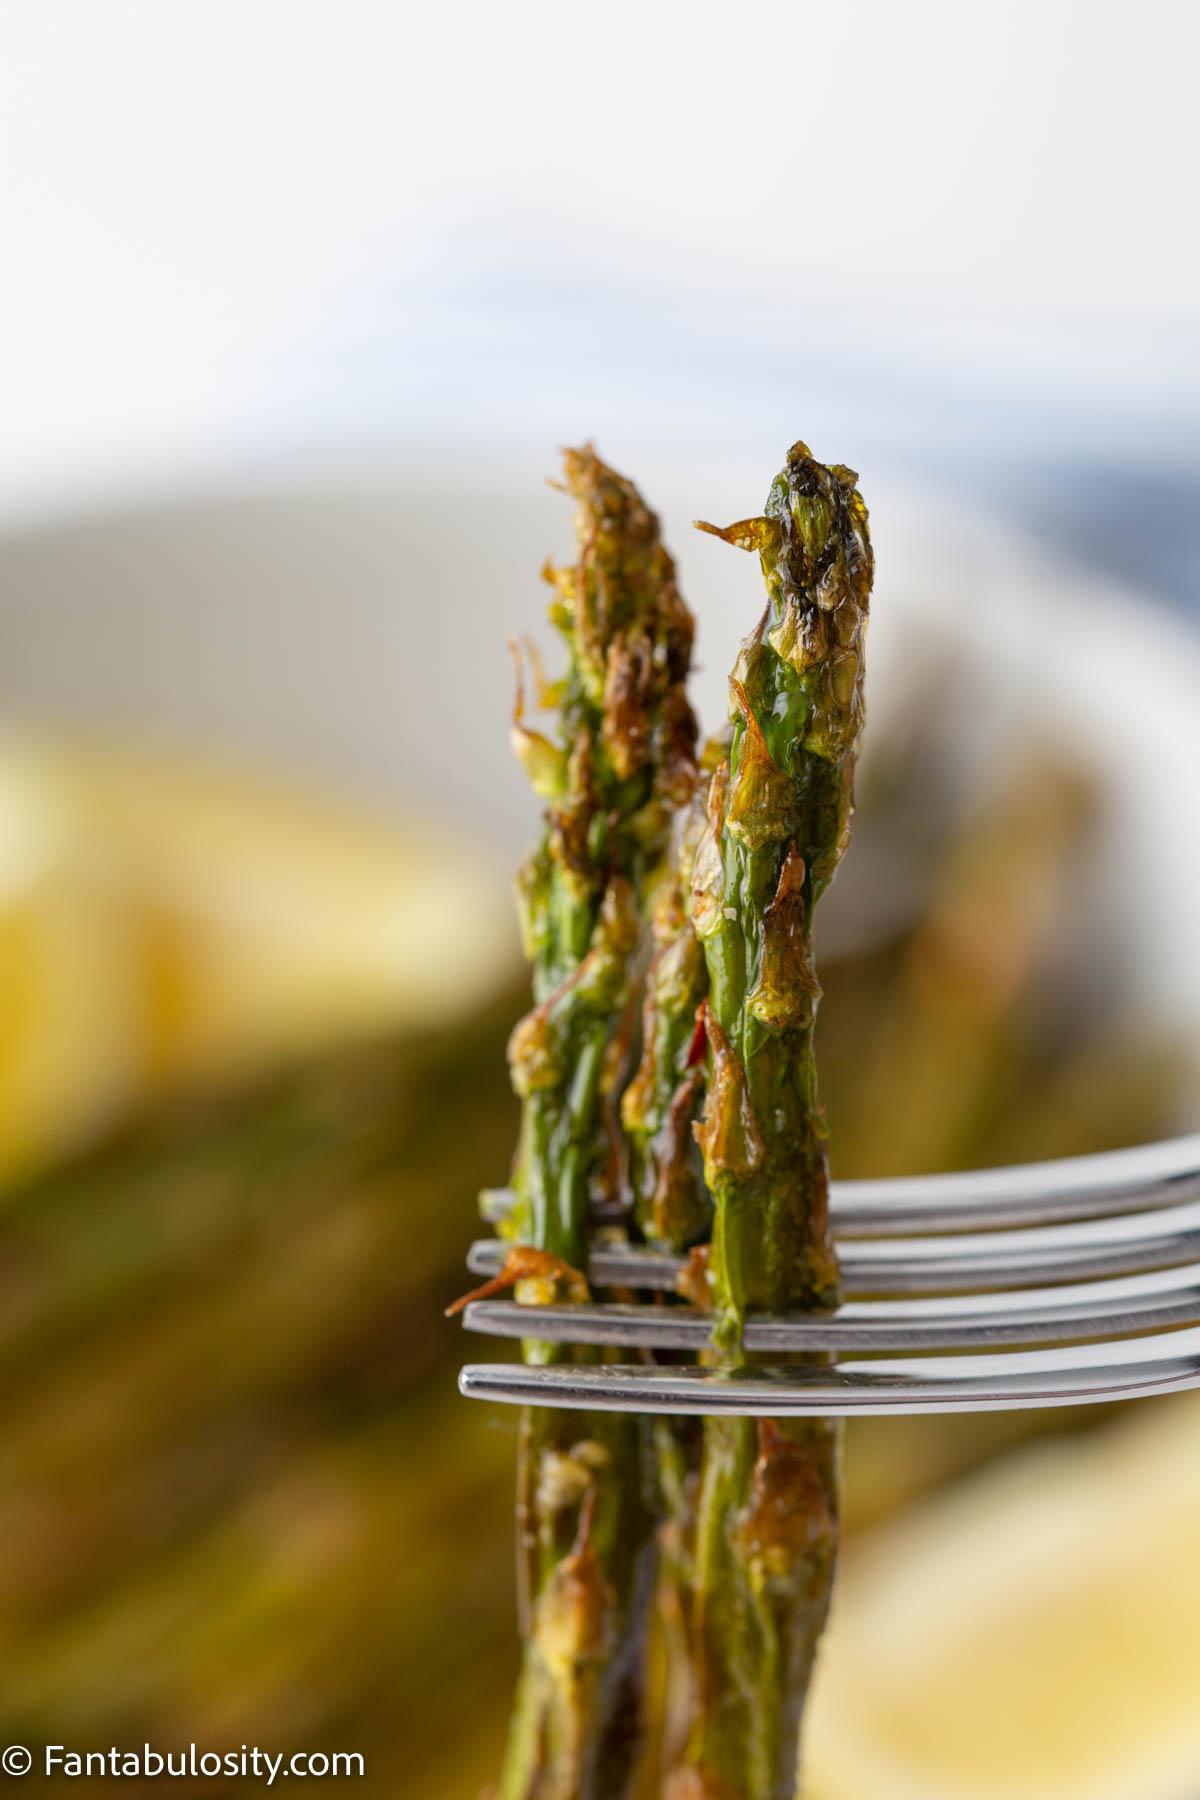 healthy air fryer asparagus on a fork, close-up